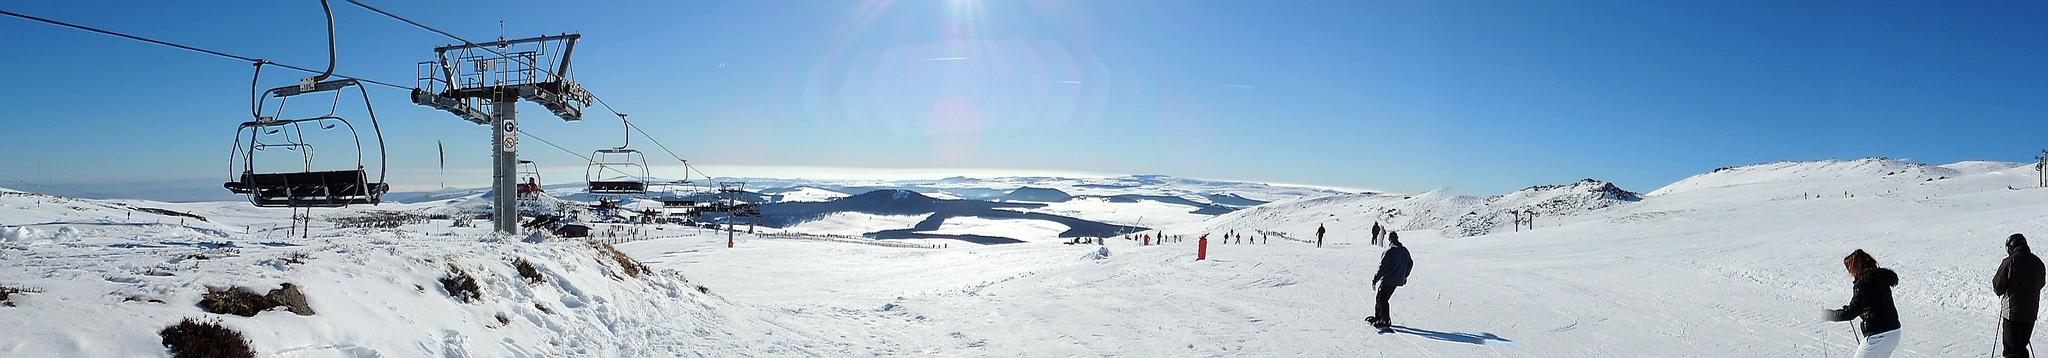 Last minute skivakantie